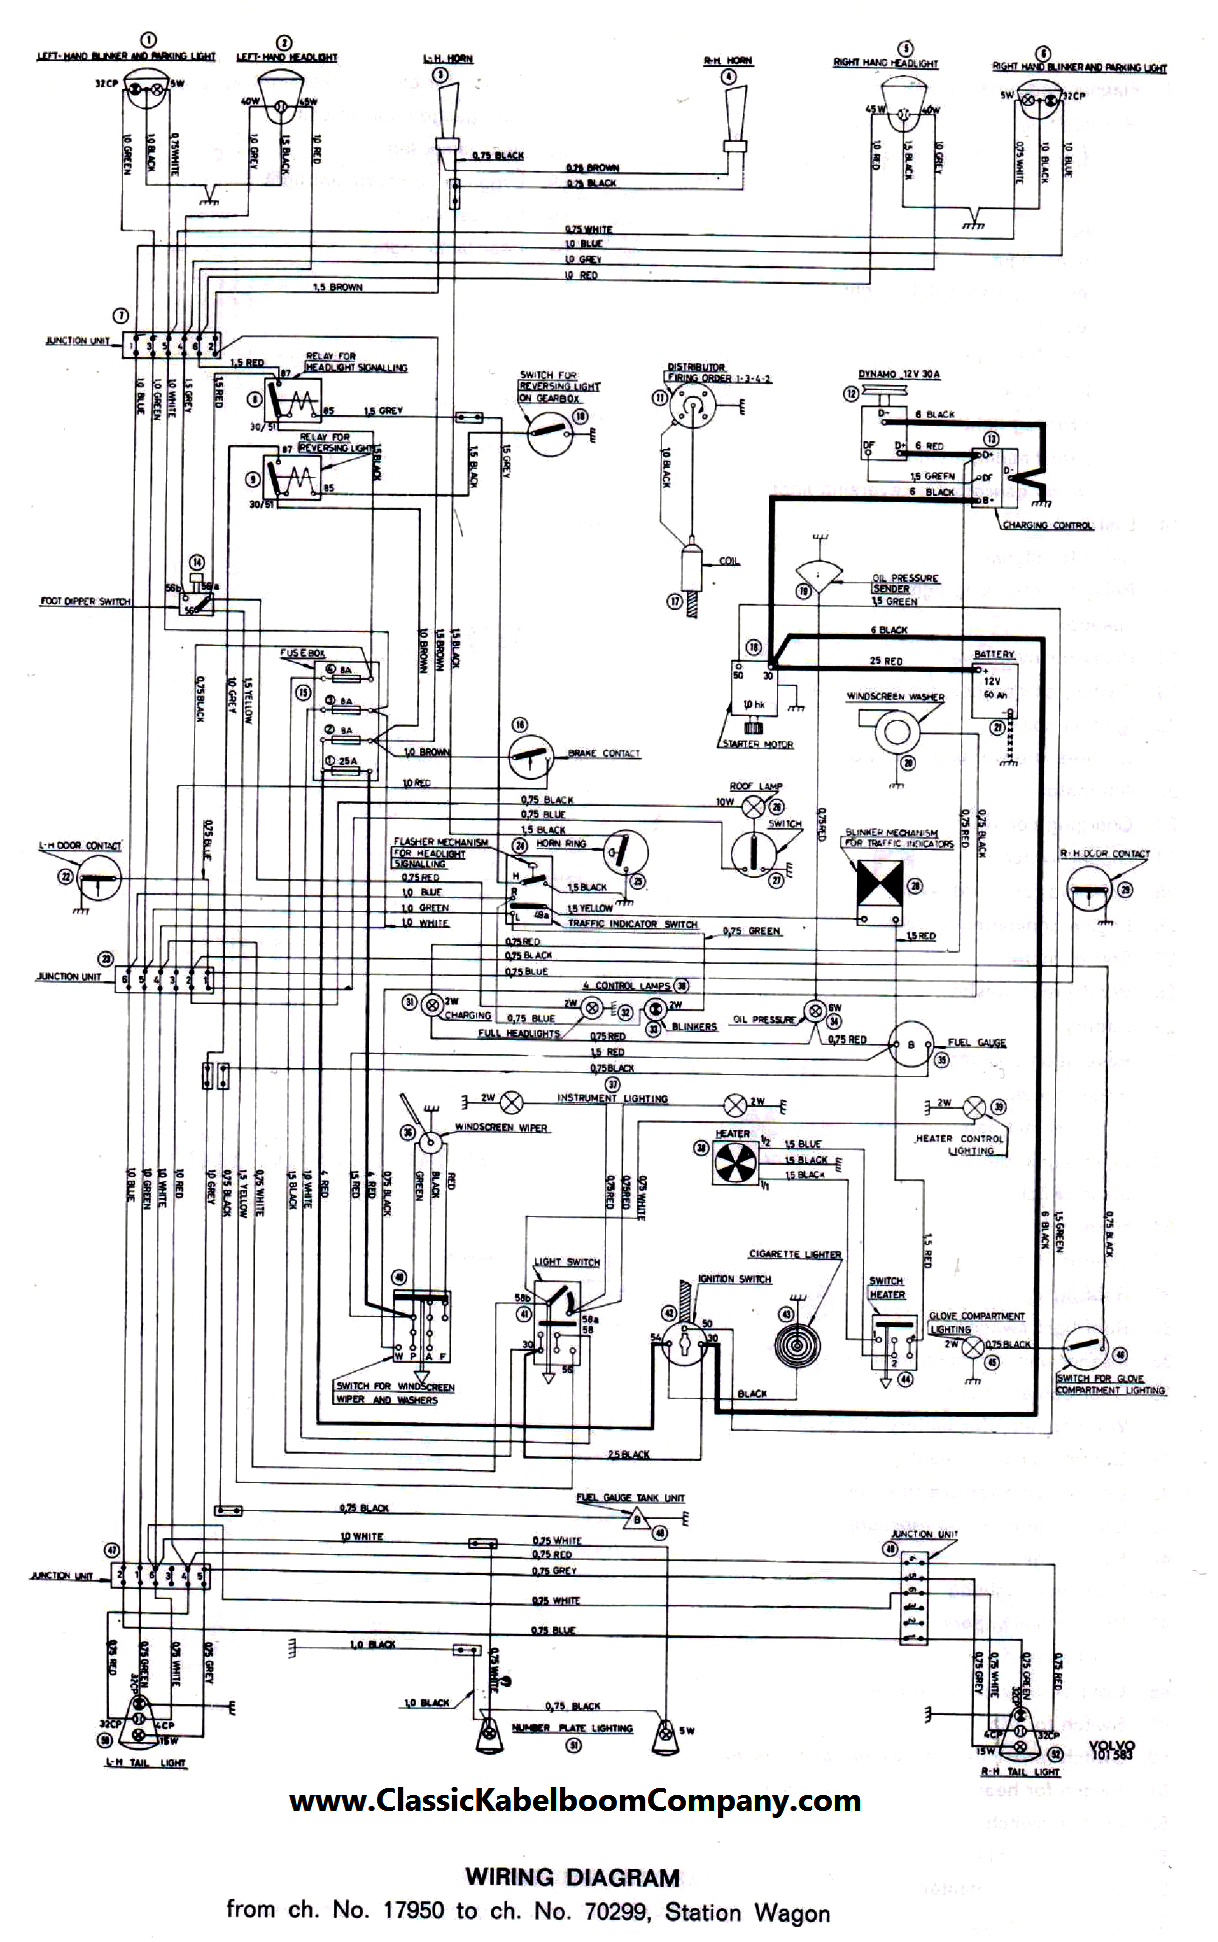 Volvo 122 Wiring Diagram - DIY Wiring Diagrams •